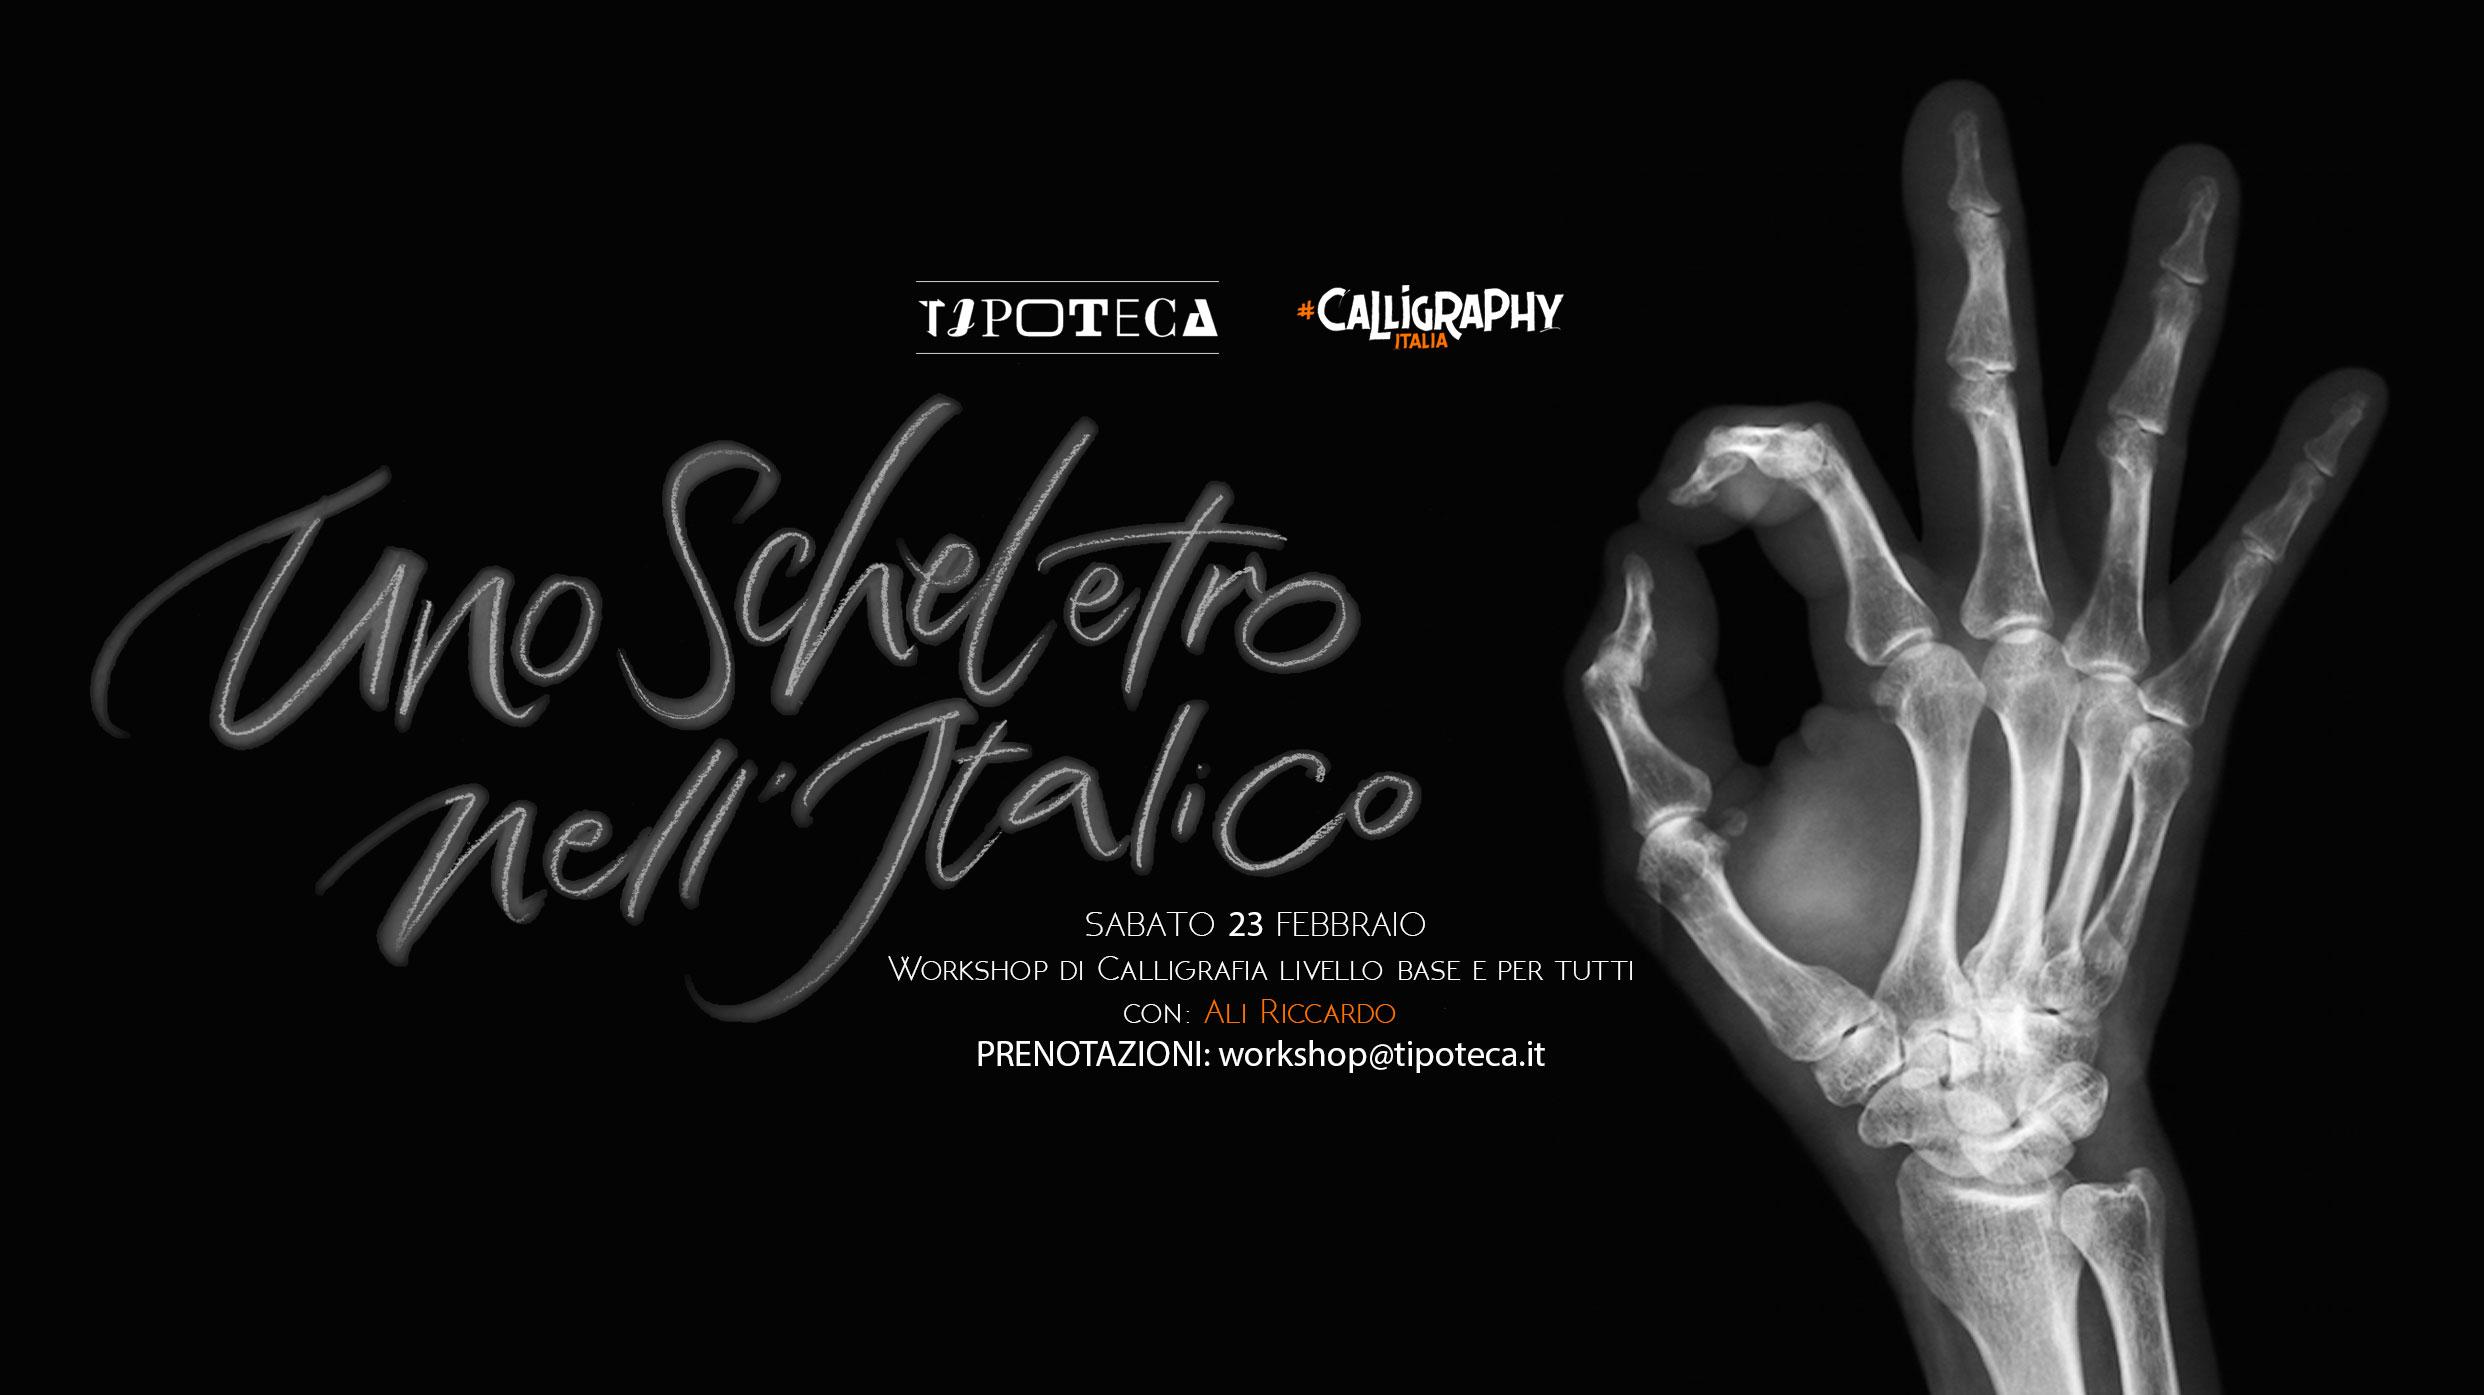 banner-scheletro-nellitalico-tipoteca-2019